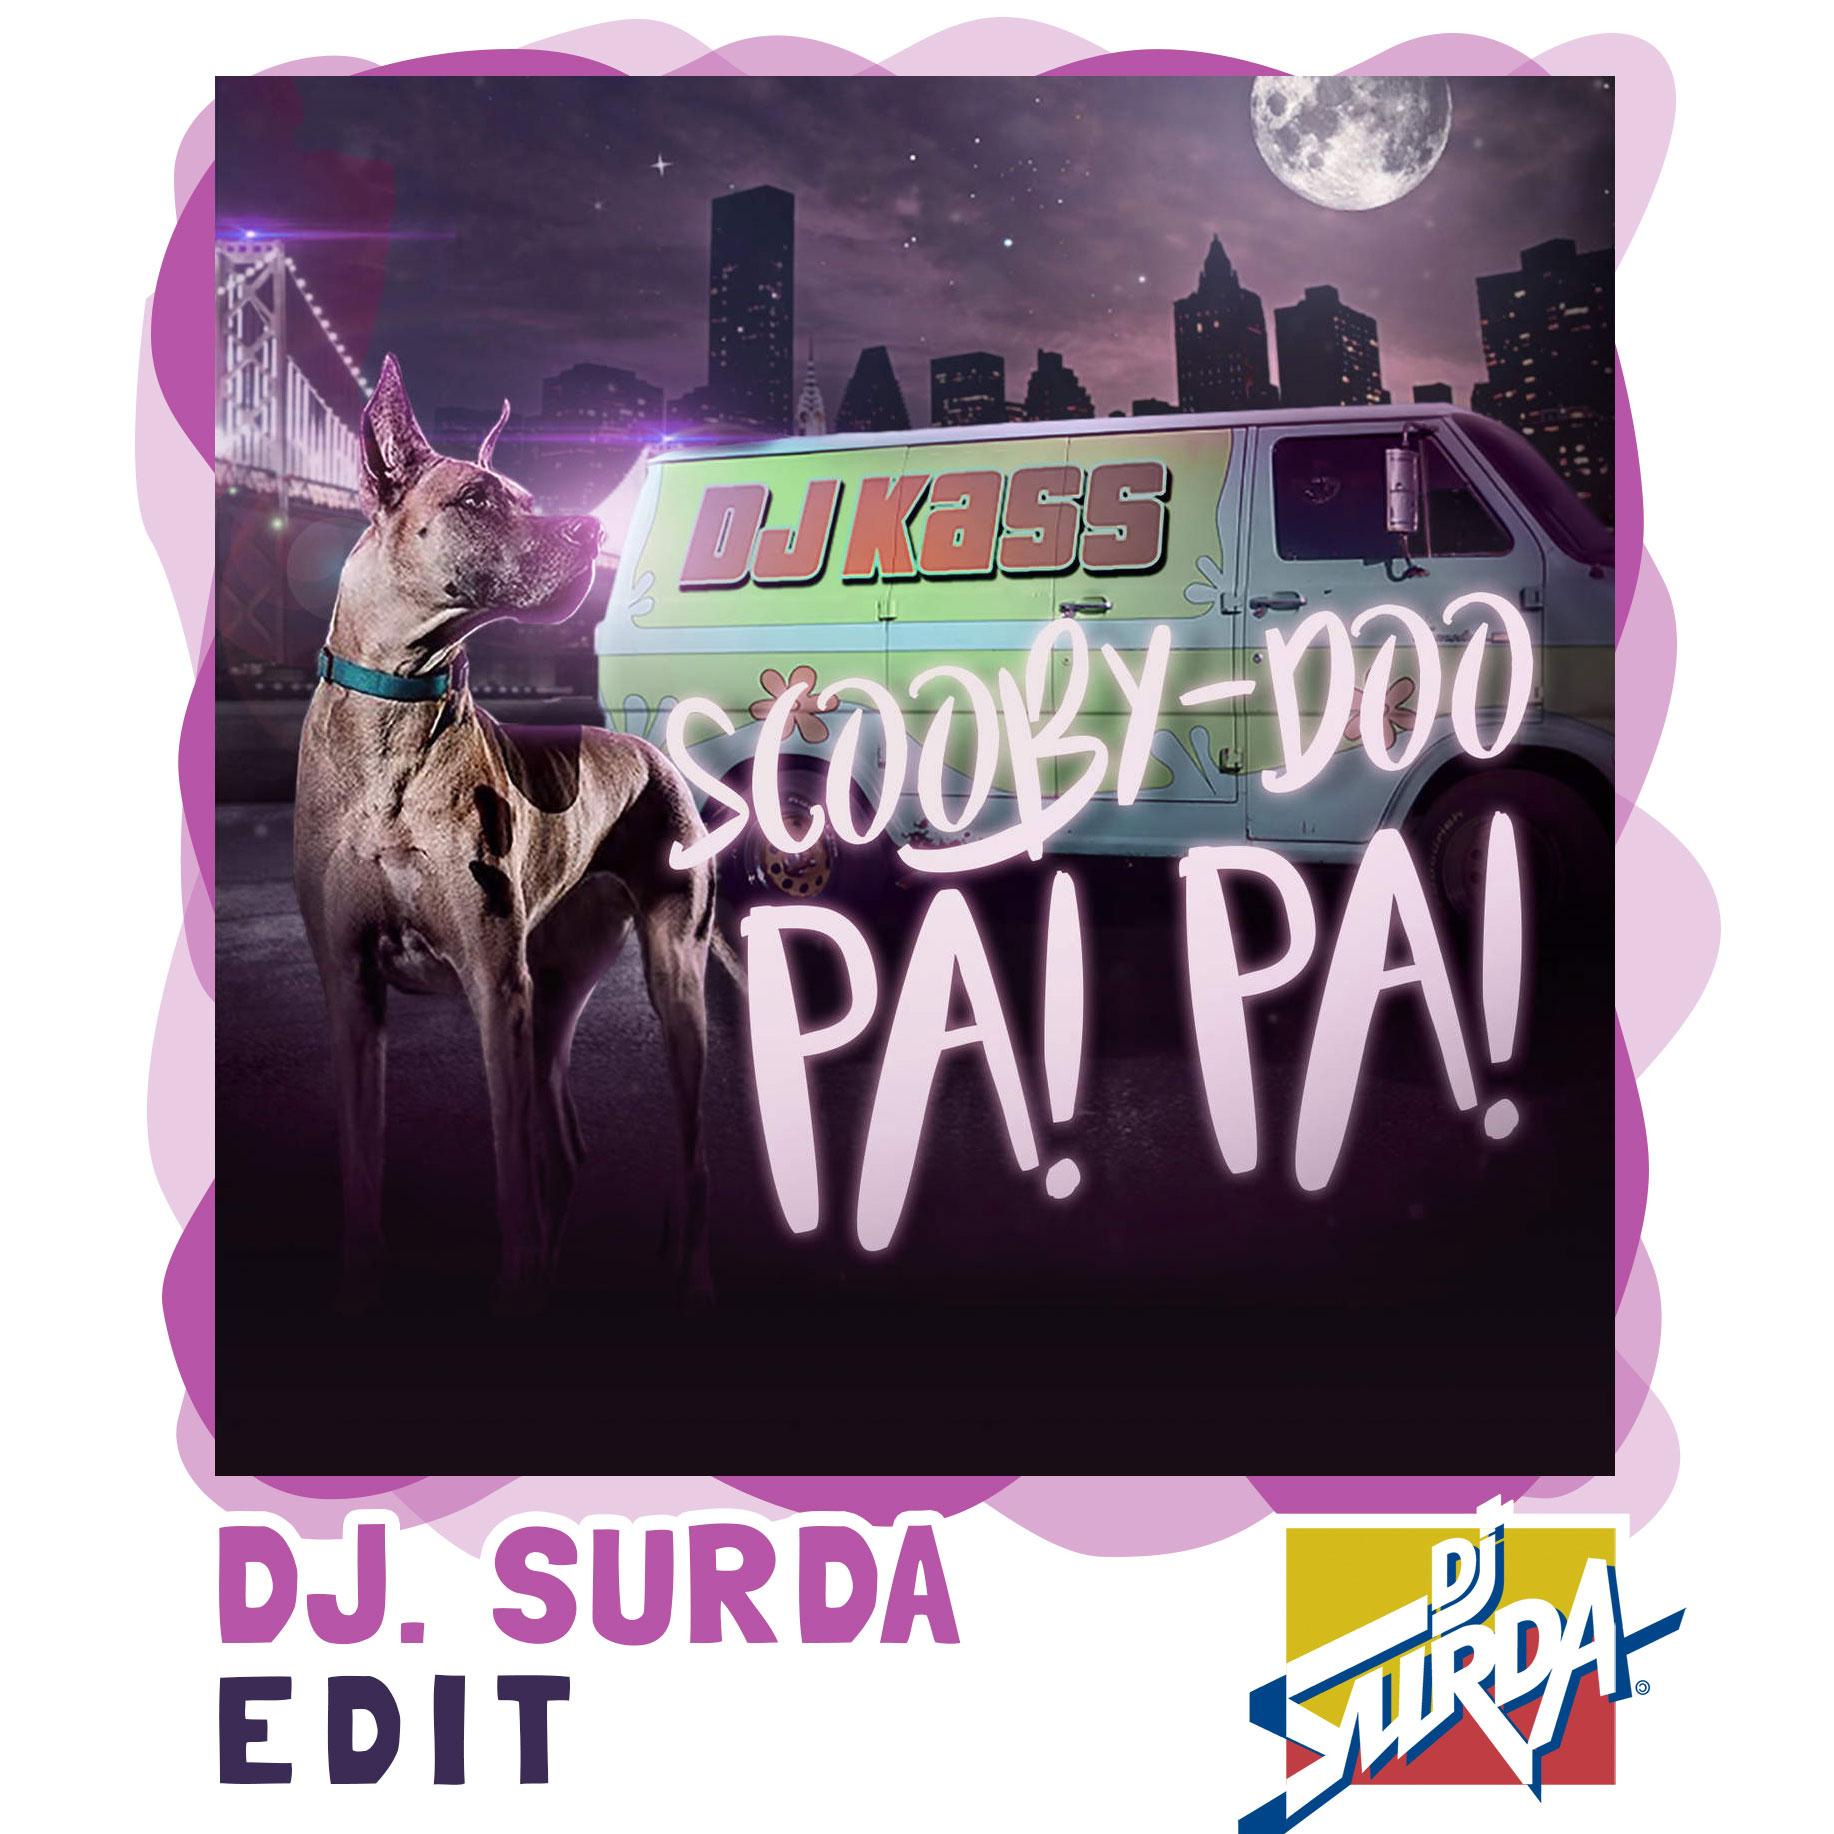 DJ Kass – Scooby Doo Pa Pa (Dj. Surda Man's Not Hot Wordplay Extended Edit)